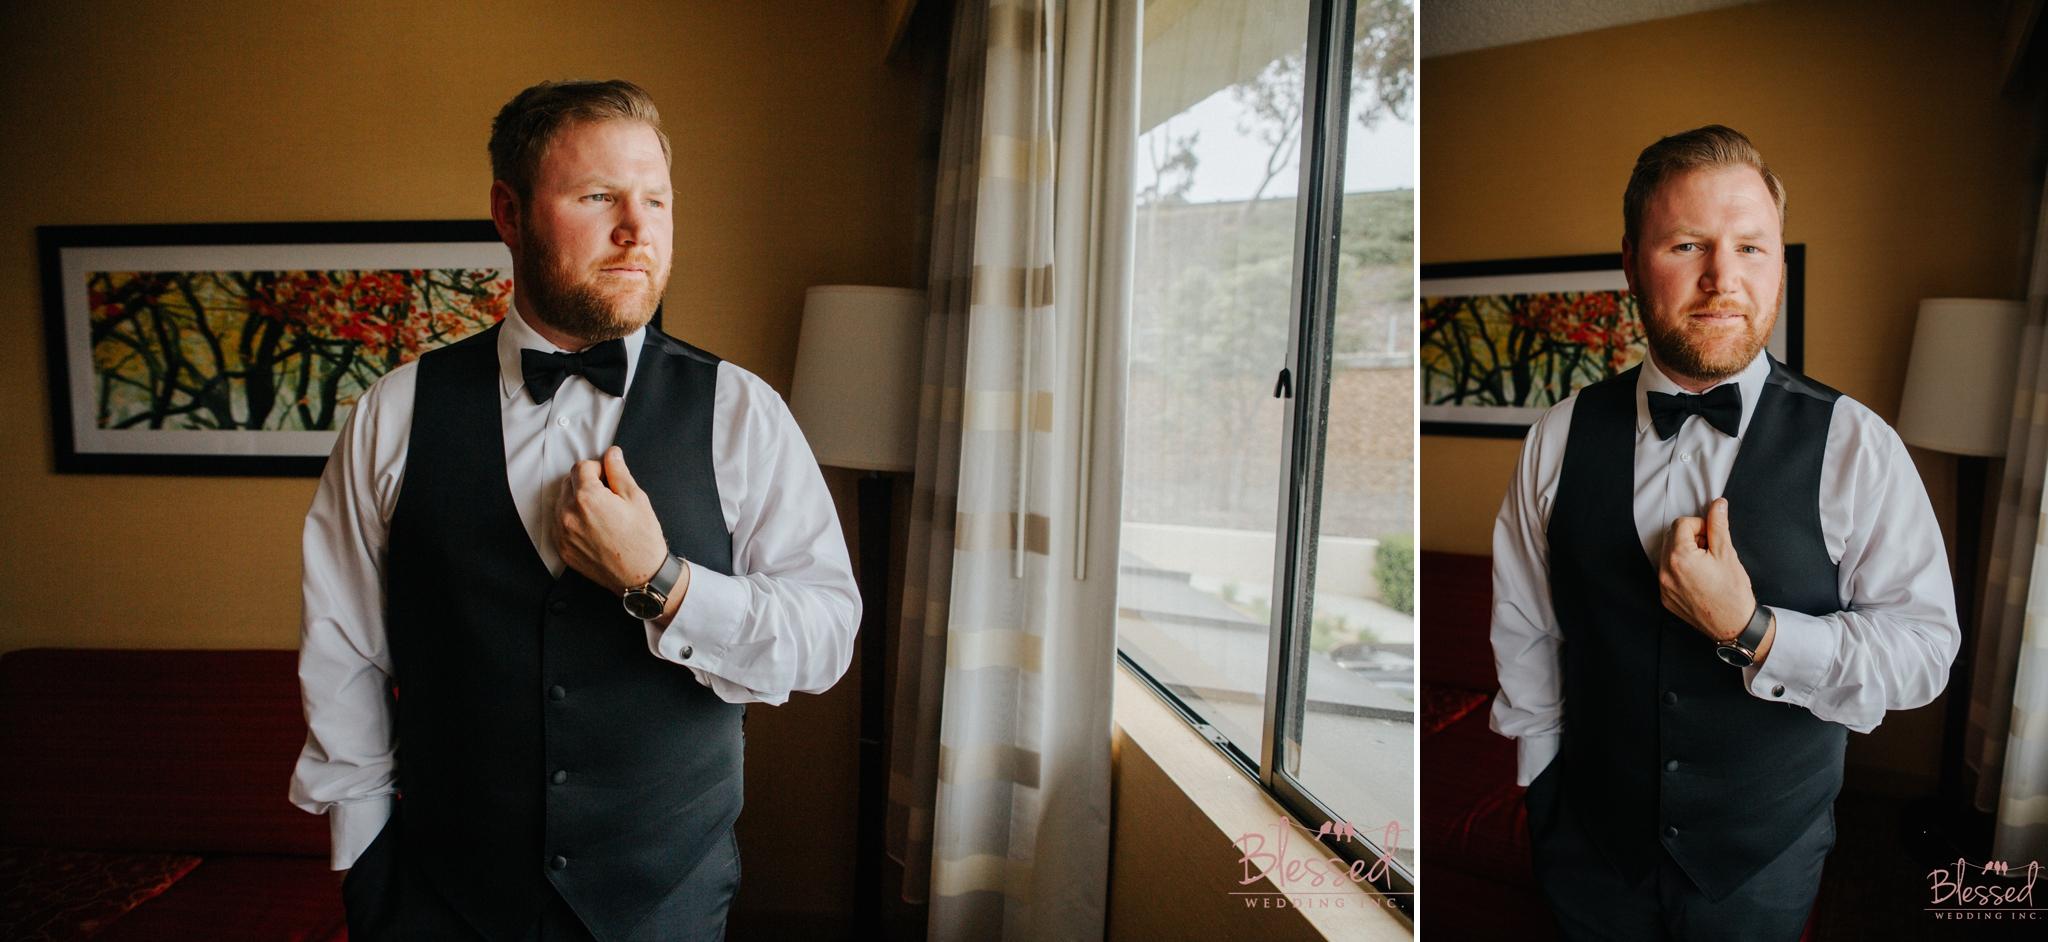 Orfila Vinery Wedding by Blessed Wedding Photography 12.jpg